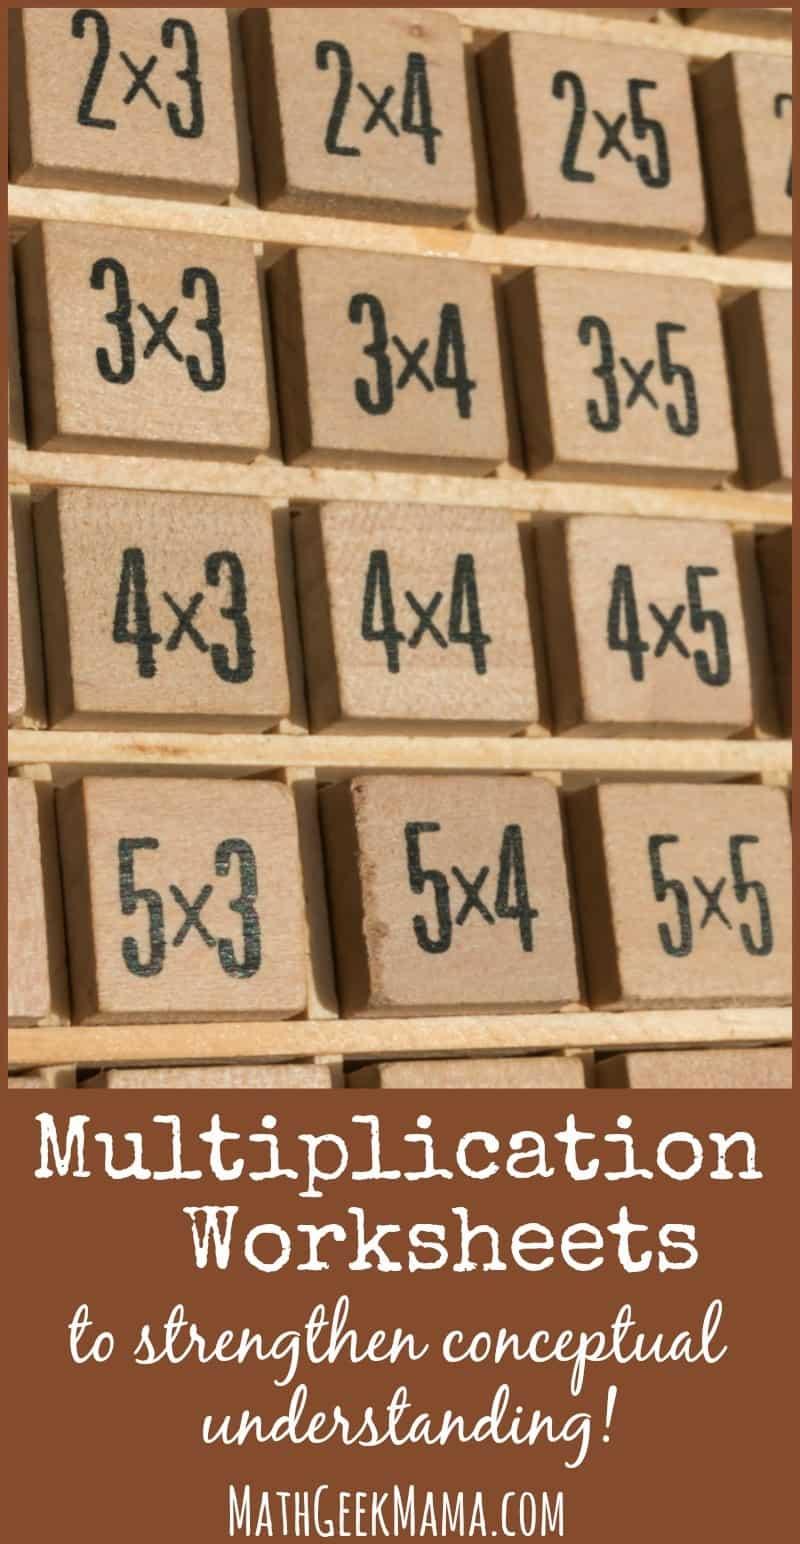 Multiplication-Worksheets-PIN